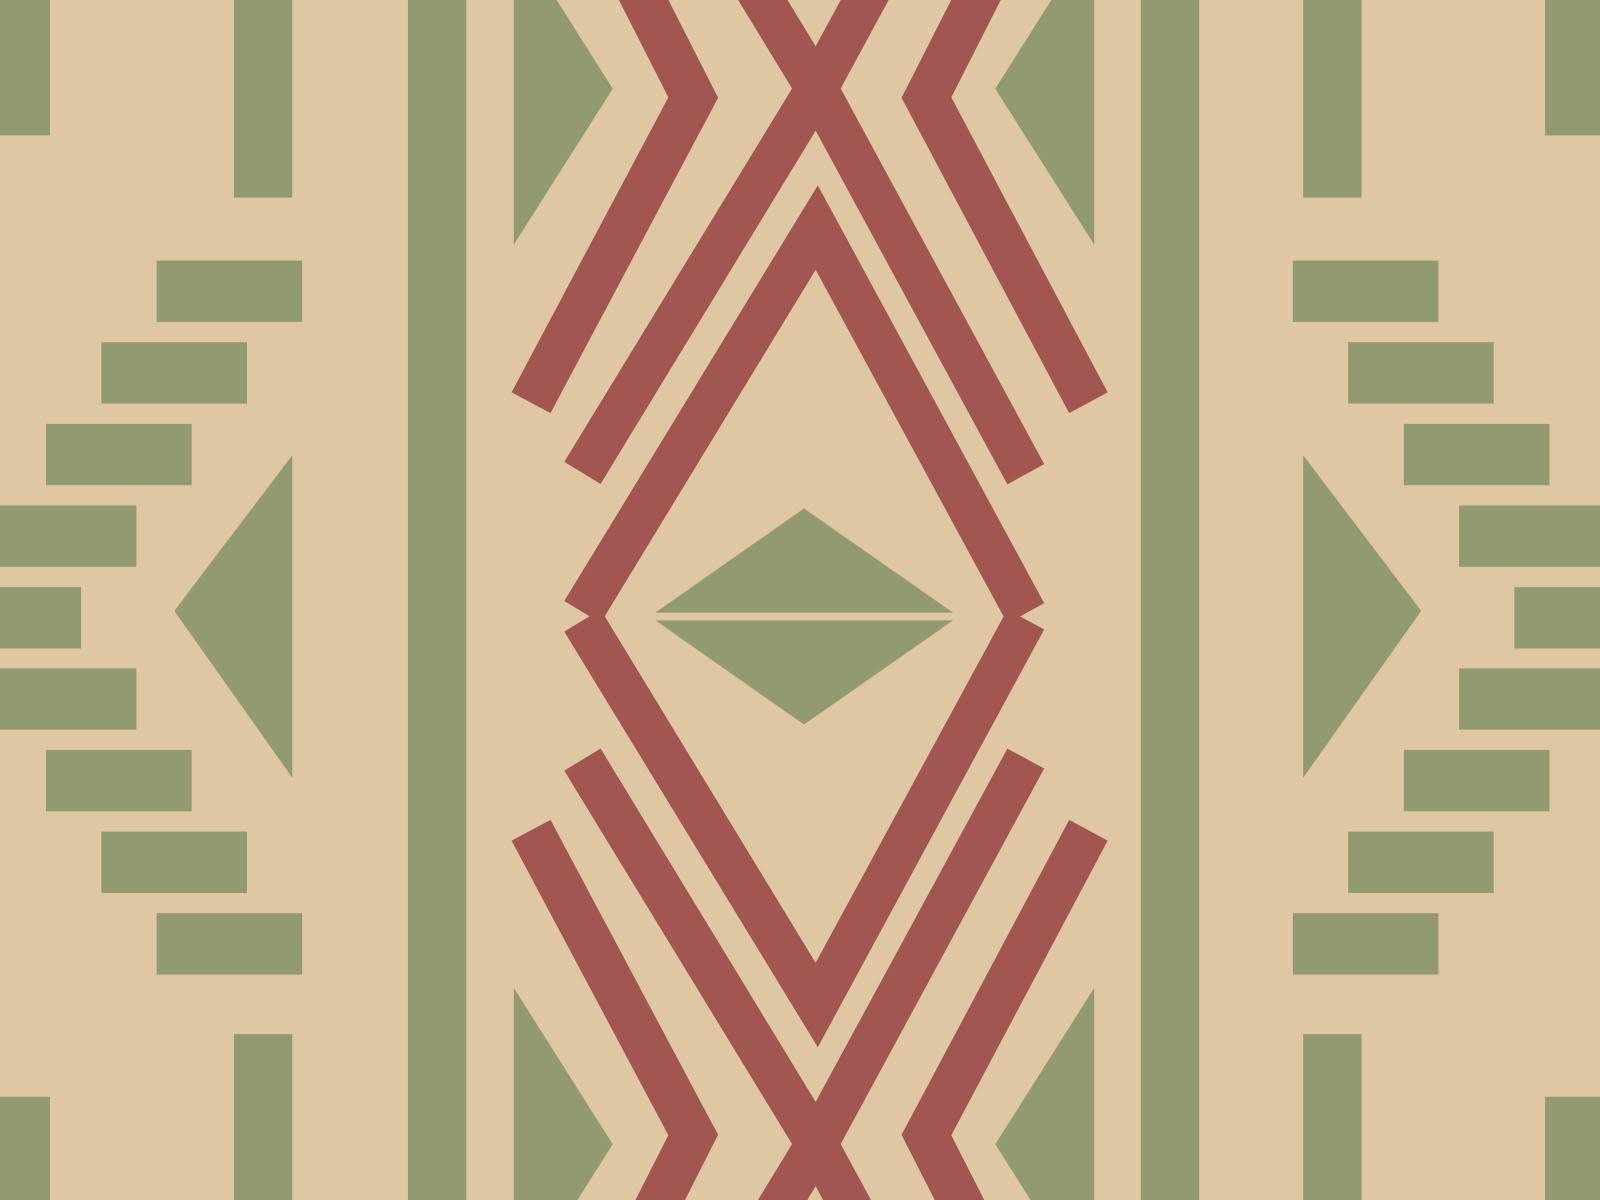 Hieroglyphs Backgrounds